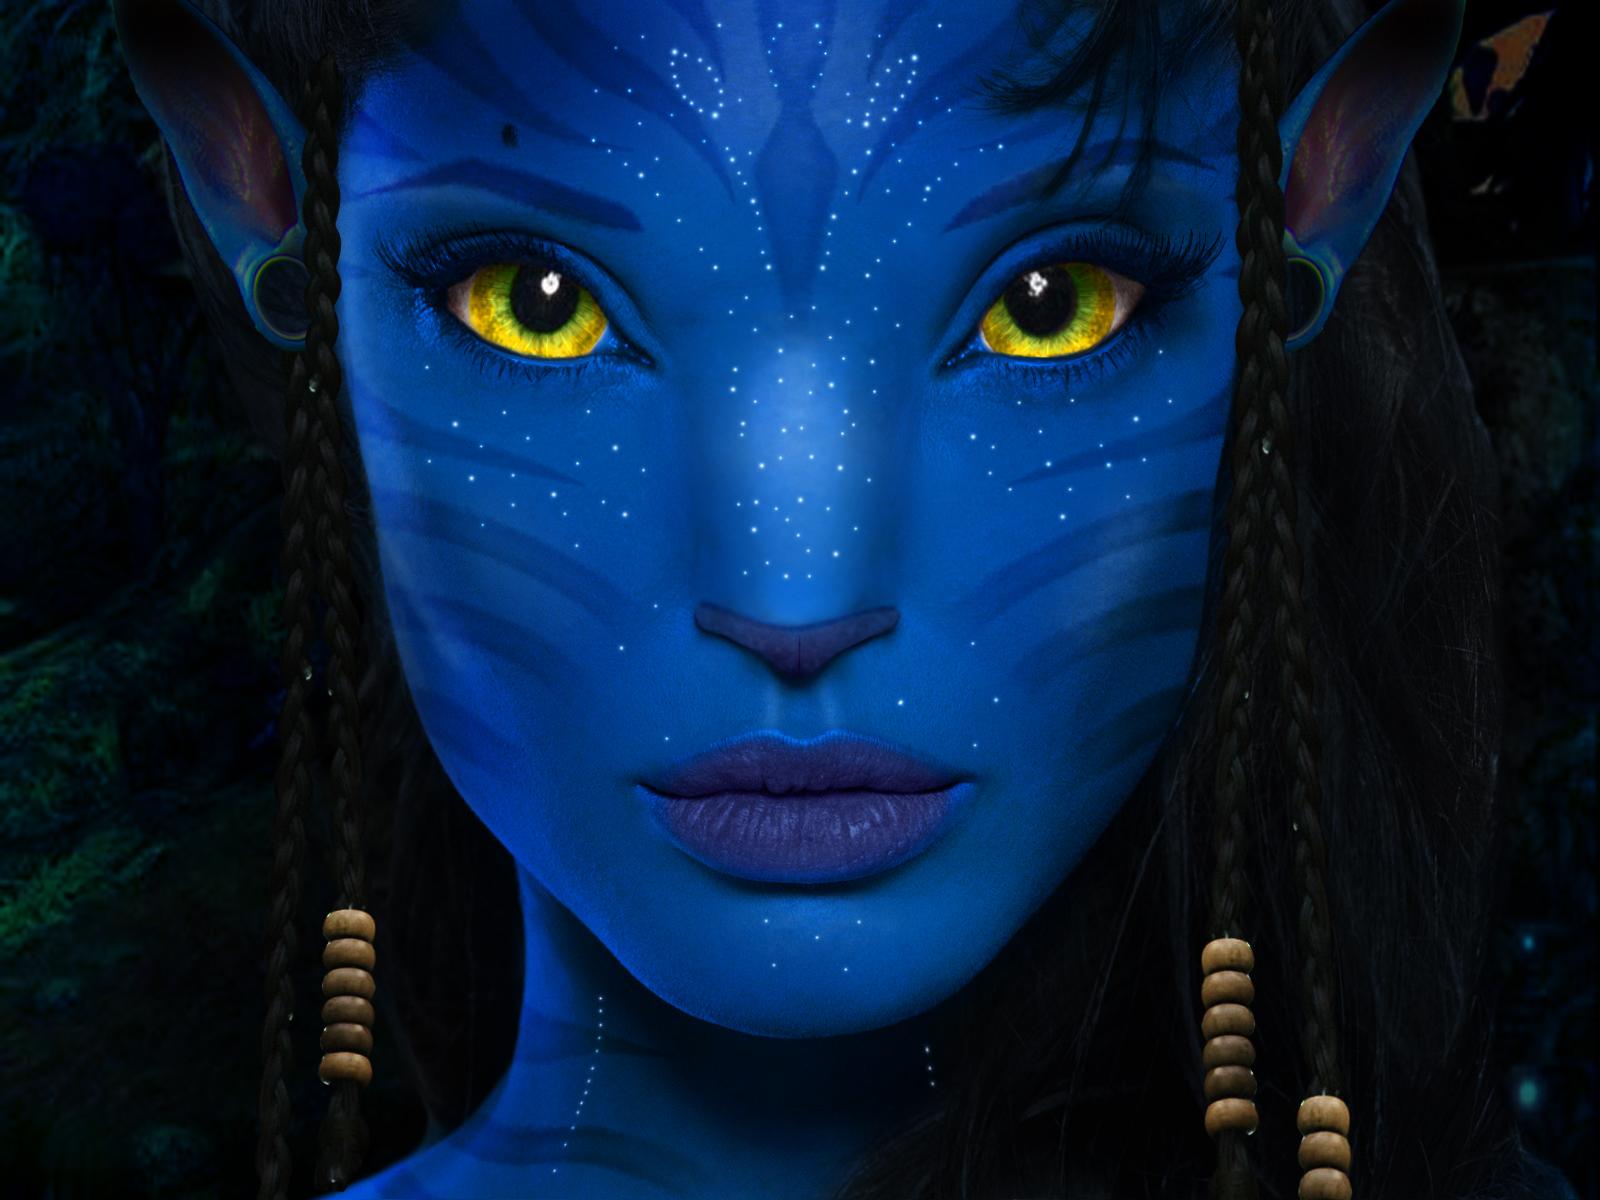 Bilder Avatar Film